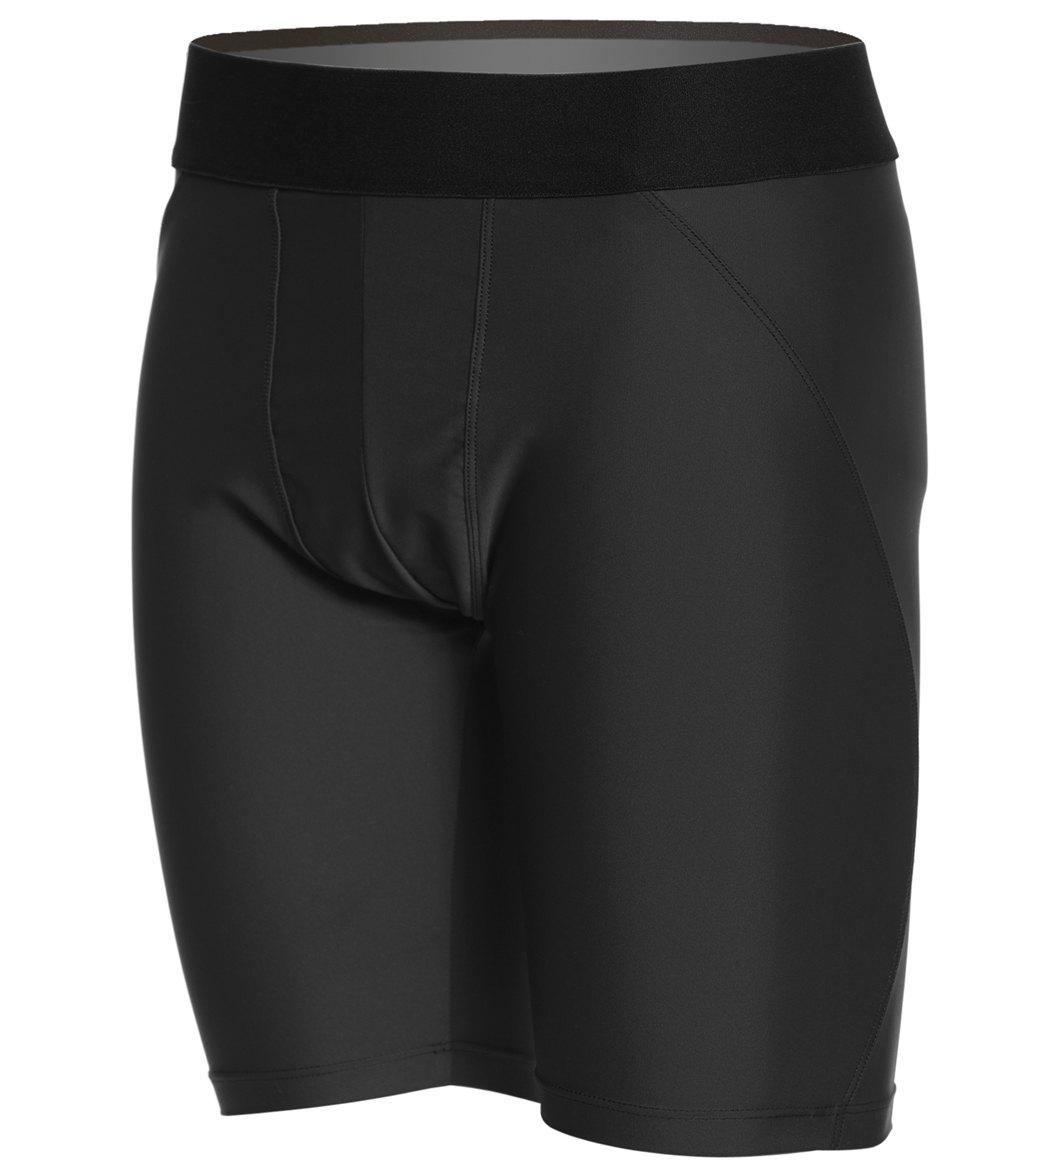 onzie menu0027s biker shorts at yogaoutlet.com orjztvd